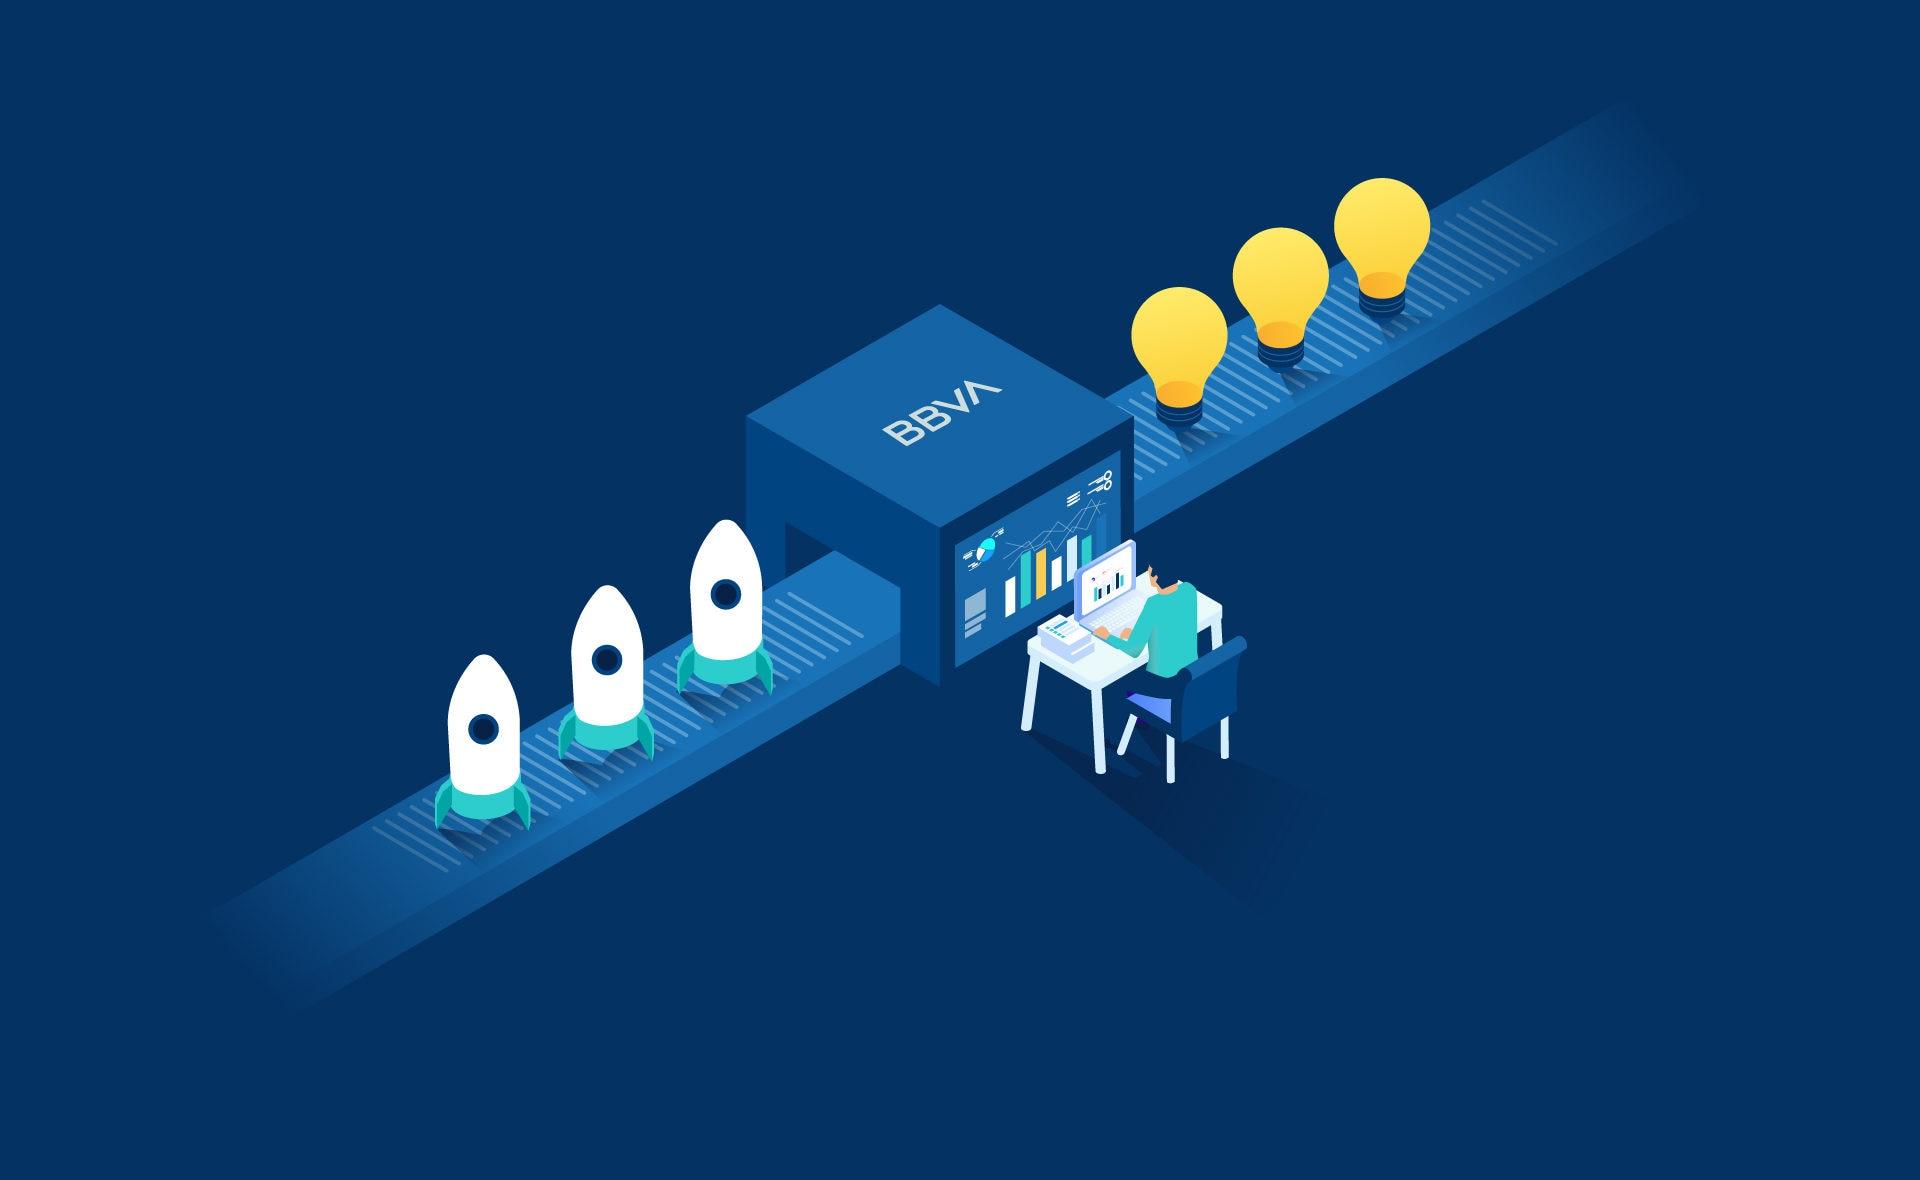 startups-resumen-innovation-tecnologia-avances